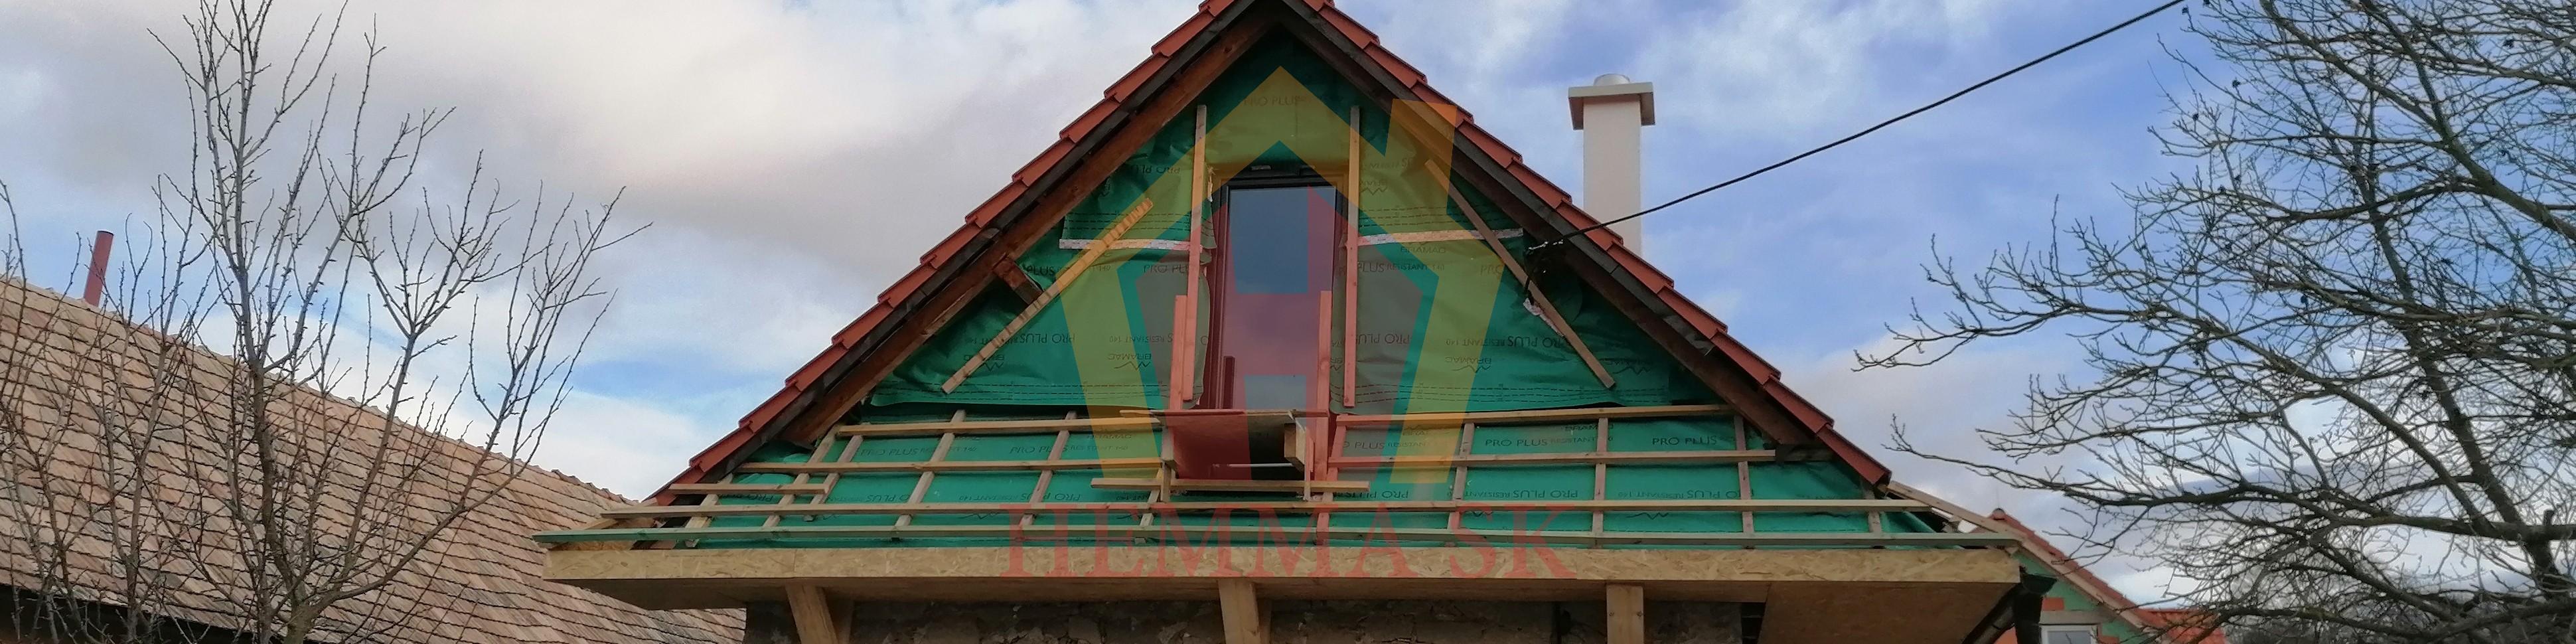 Balkón - Lukové